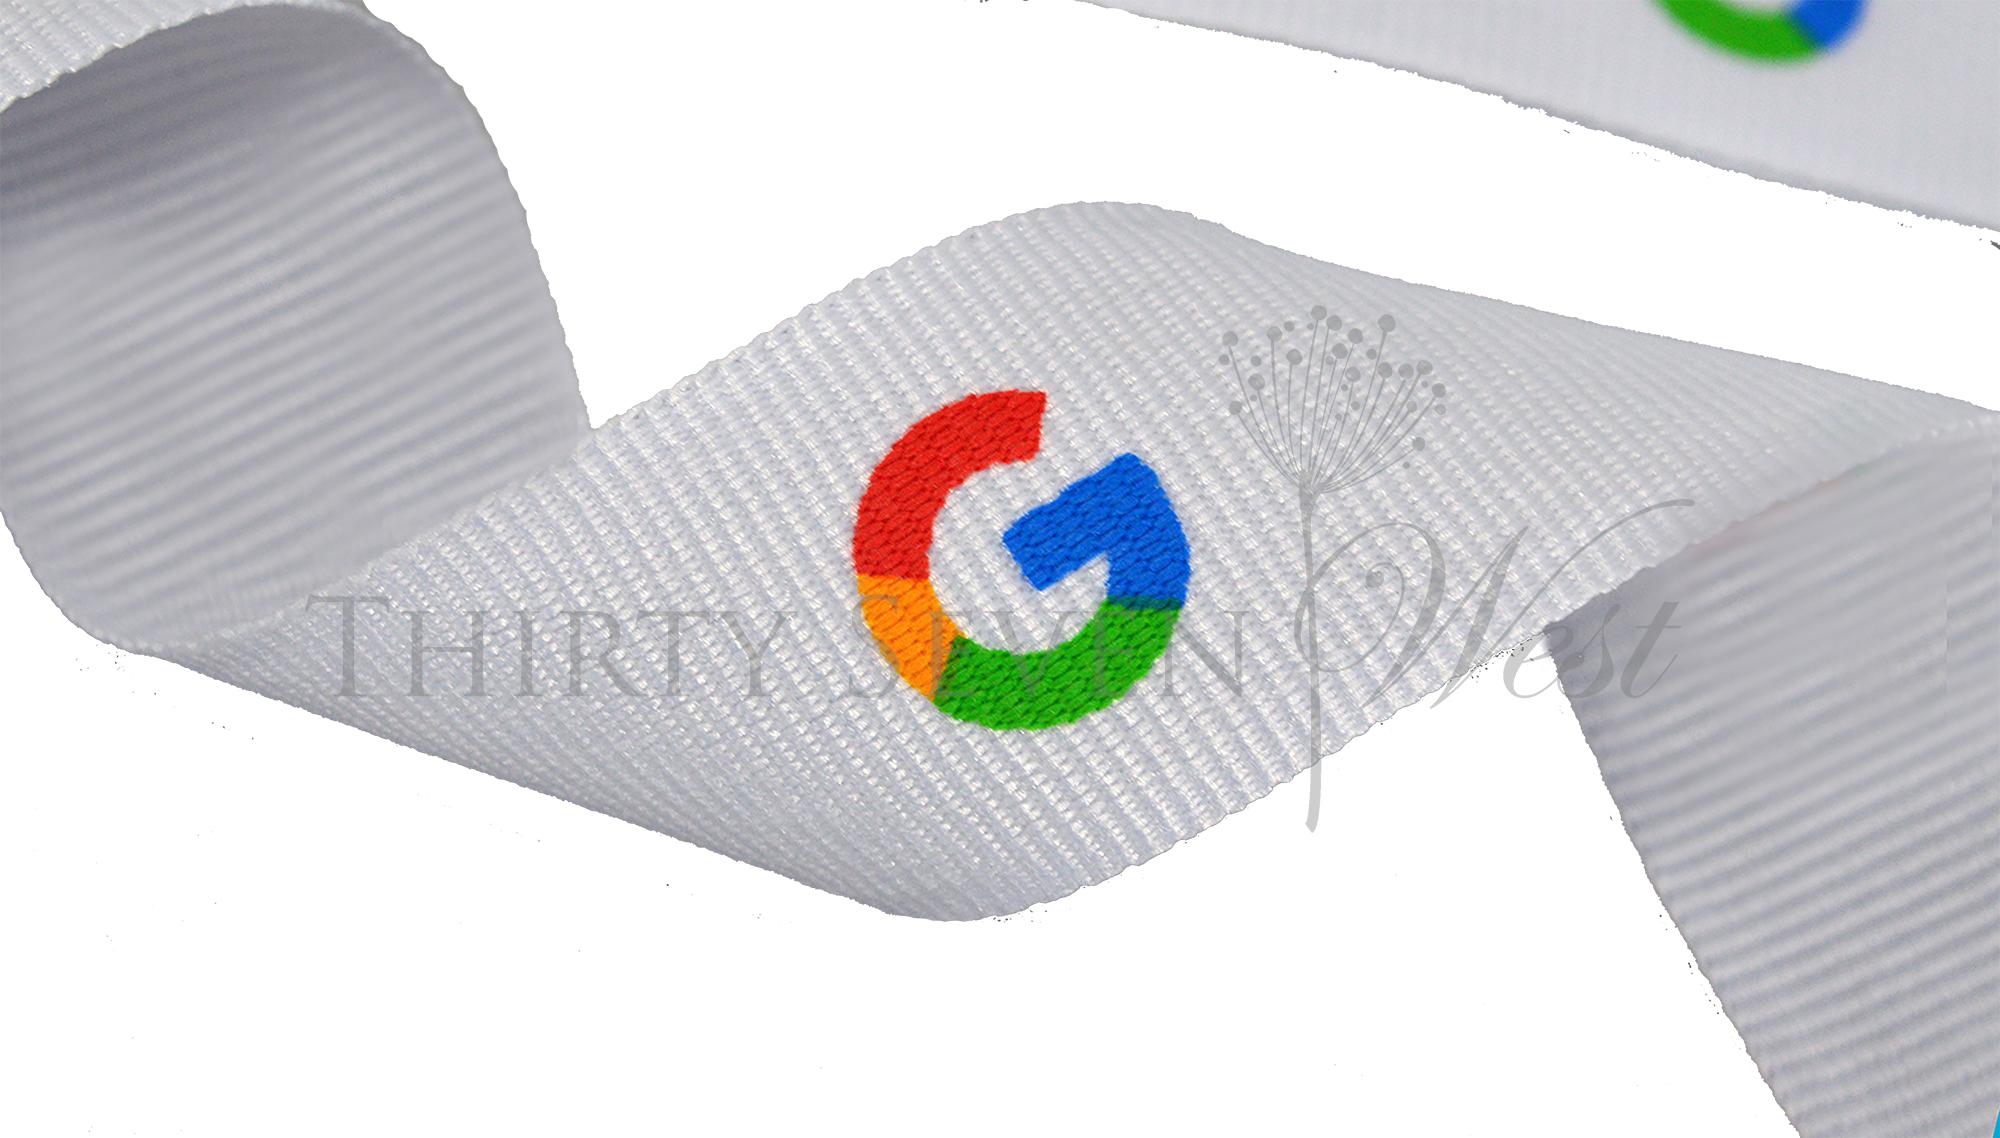 Printed ribbon, Full color print ribbon, Personalized Ribbon with logo, Custom Printed Ribbon, Customized Ribbon, Printed Logo Ribbon, Ribbon Print , BRanded Ribbon, Satin Logo RIbbon, Custom Logo Ribbon, Logo Ribbon., Custom Logo Ribbon, customized Ribbon, Custom Printed Ribbon, Full Color printed Ribbon, Logo Printed Ribbon.